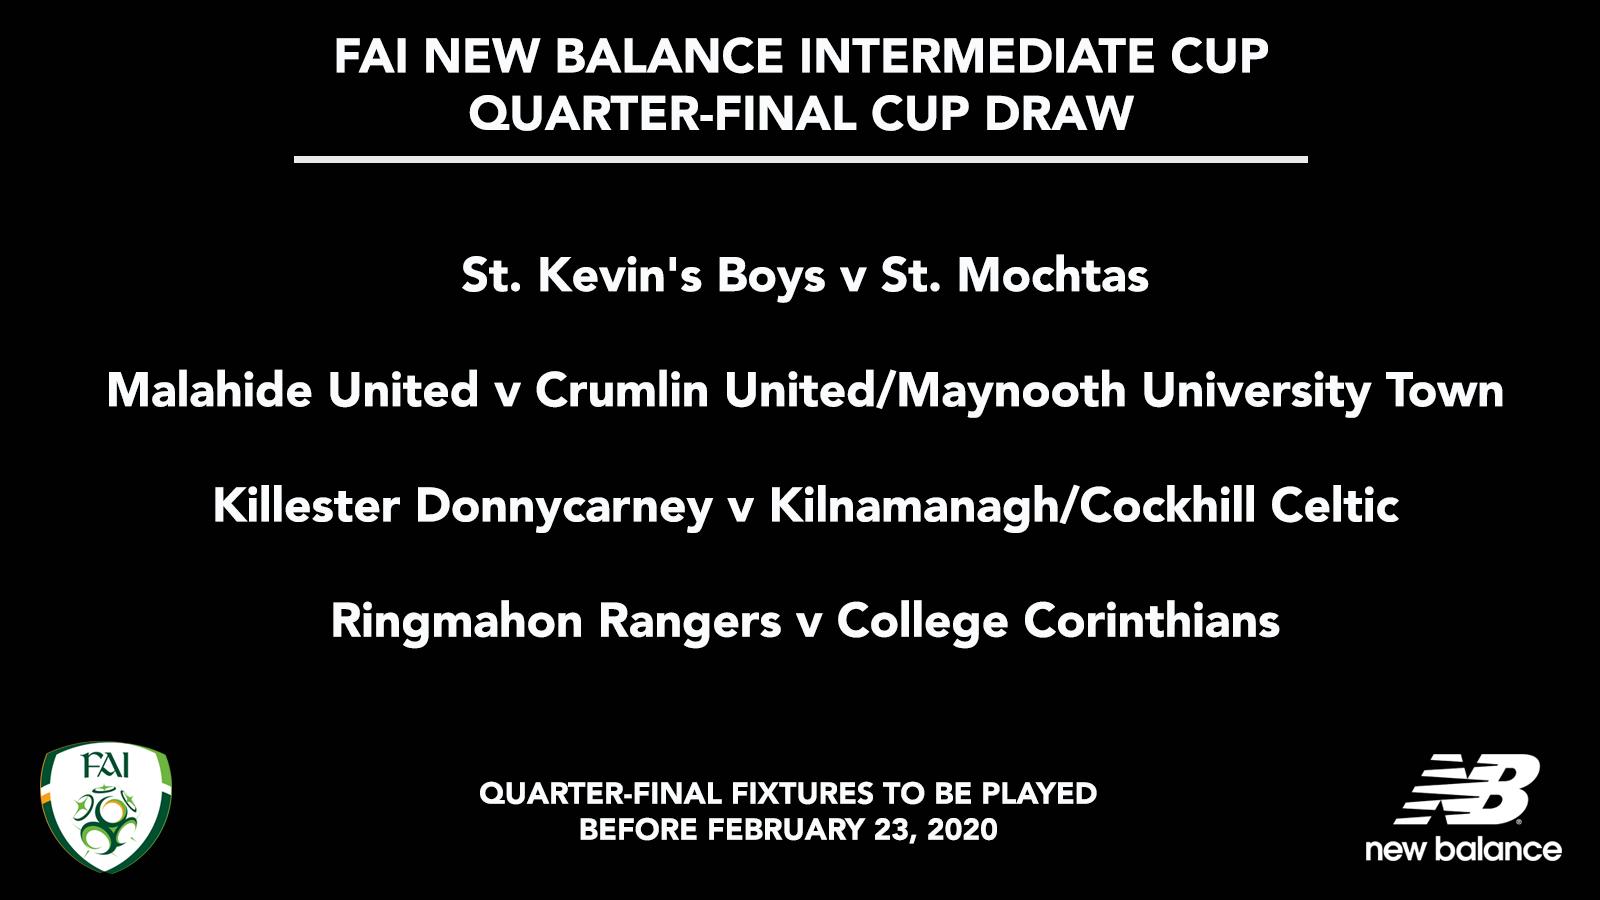 Fai intermediate cup betting sites futbol24 prediction today/betting